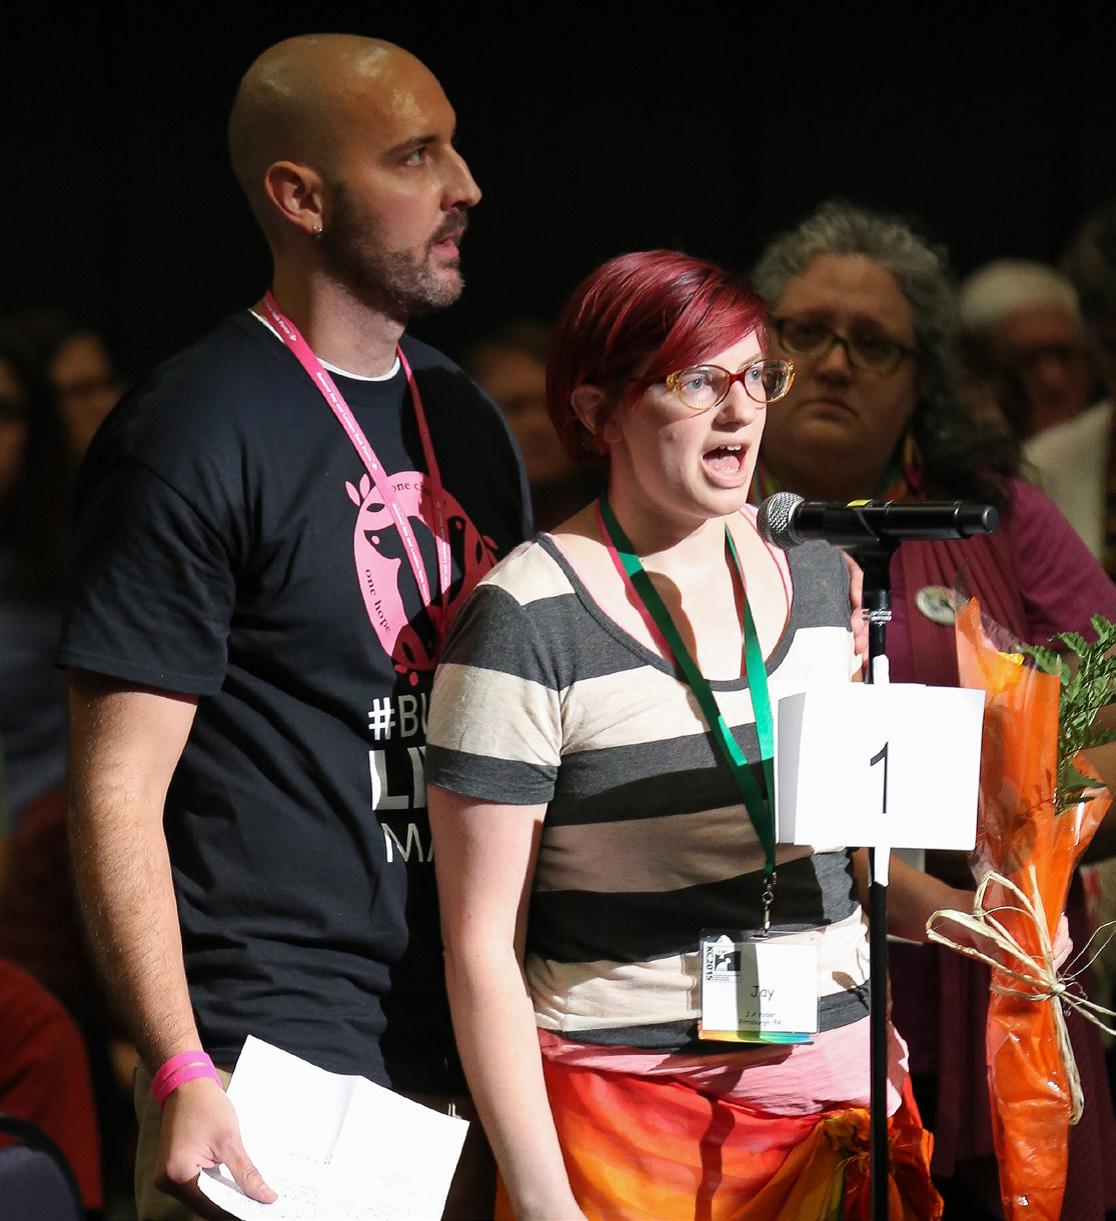 Jennifer Yoder of Pink Menno addresses the delegates, Saturday, July 4, 2015, Kansas City, Missouri.